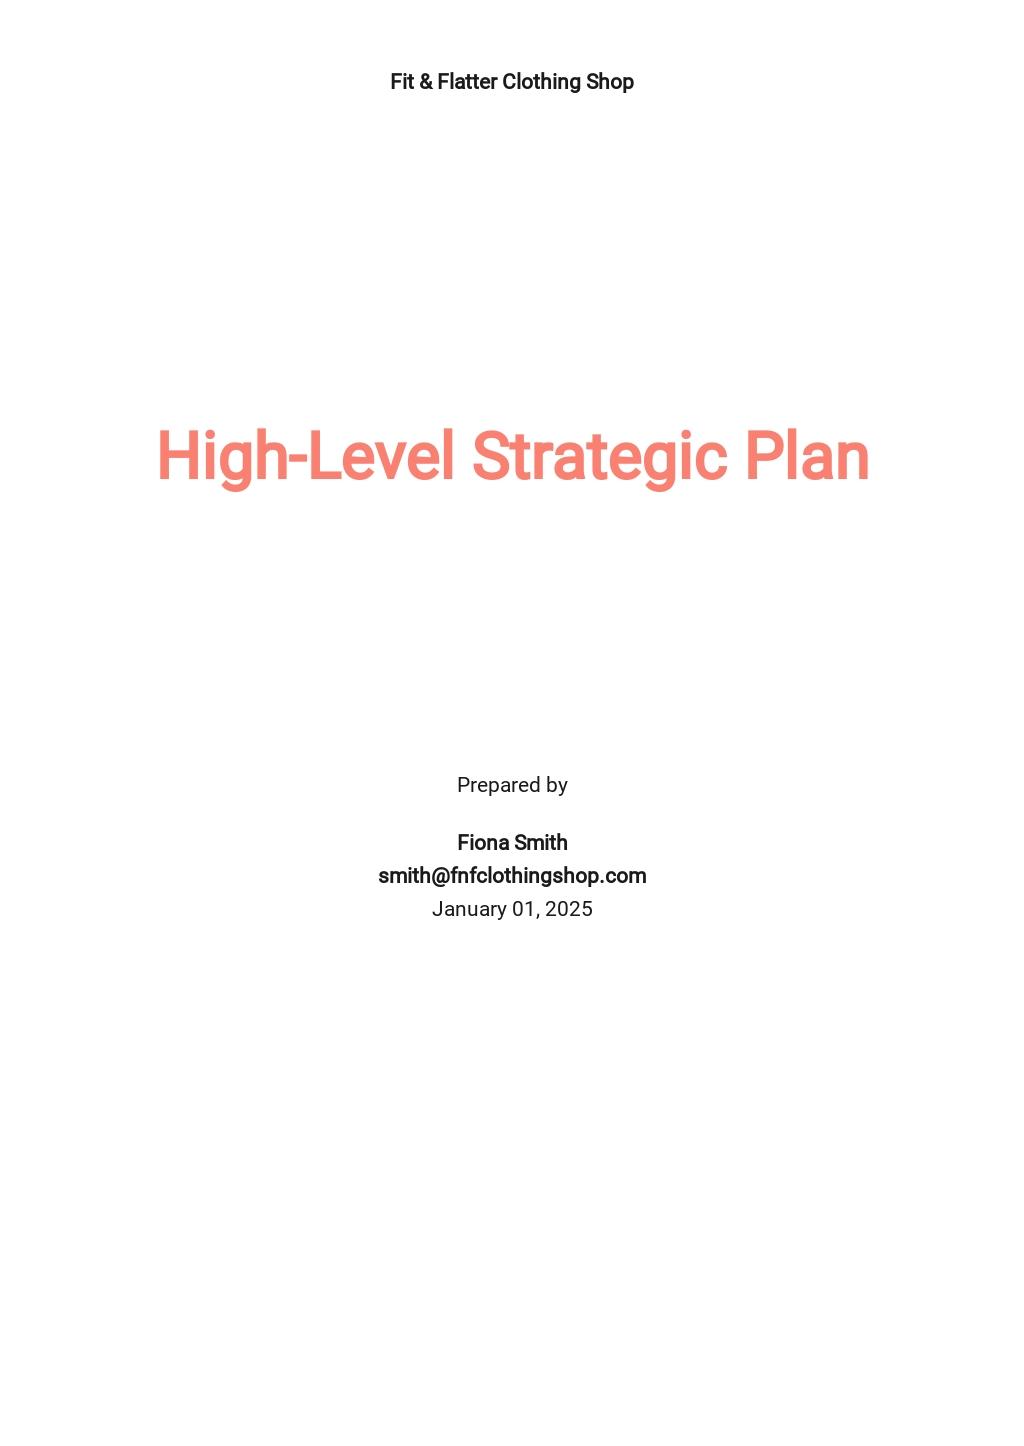 High-Level Strategic Plan Template